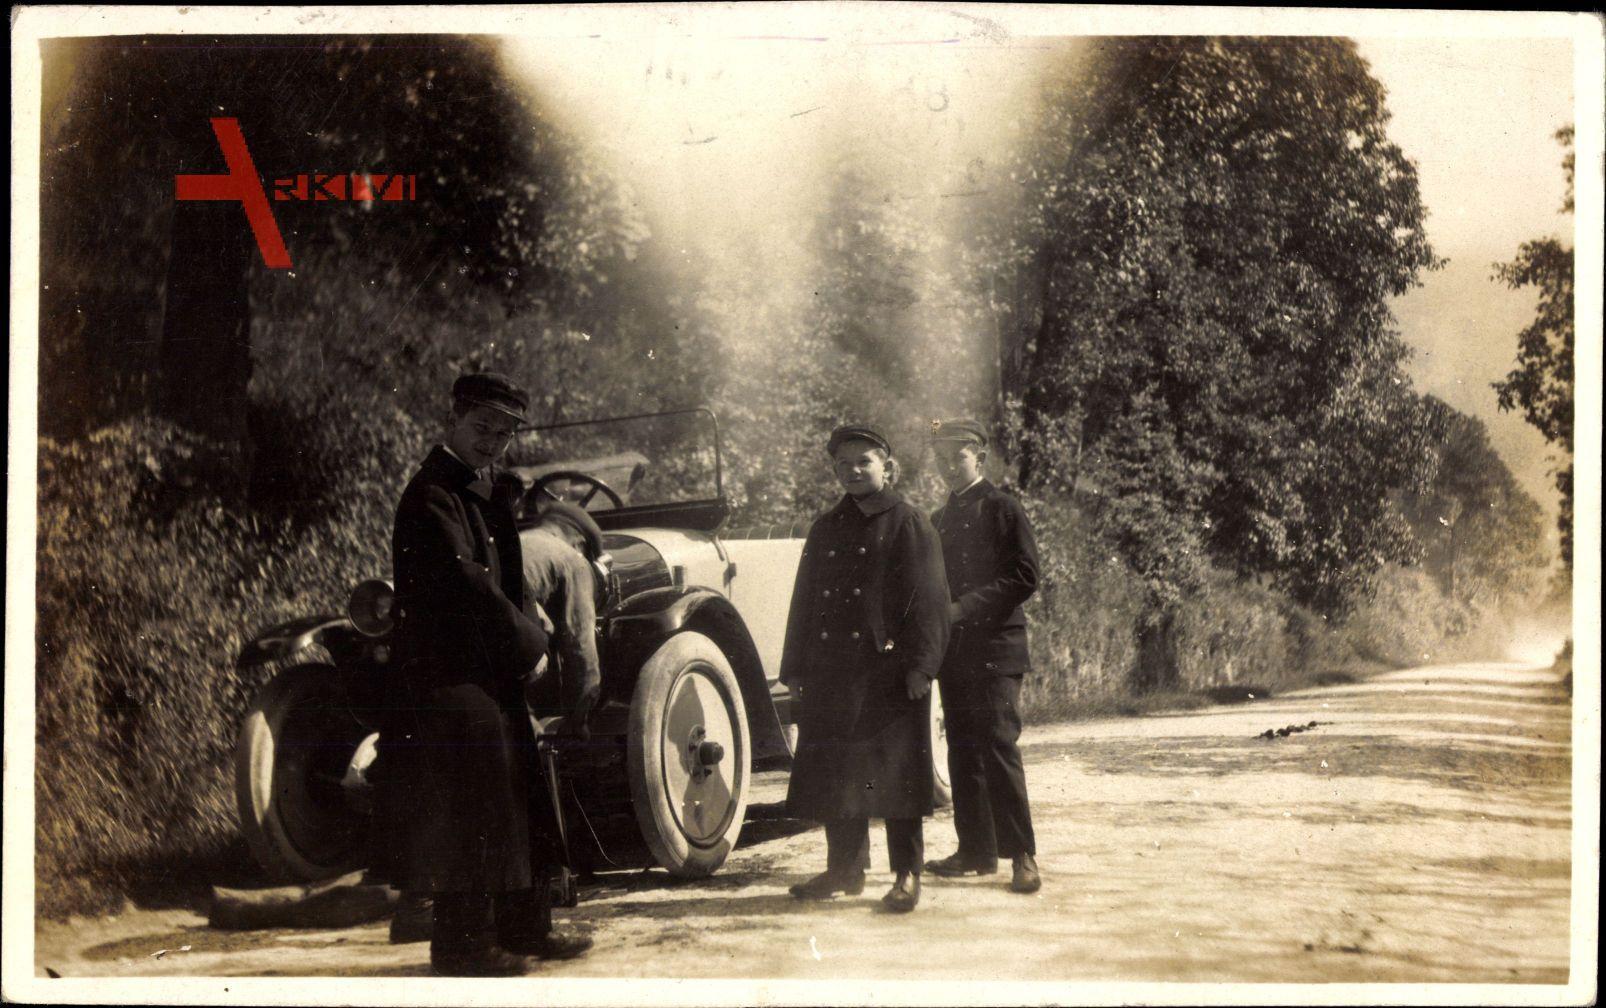 Automobil, Kurbelstart, Kinder in Mänteln, Spazierfahrt, Landstraße